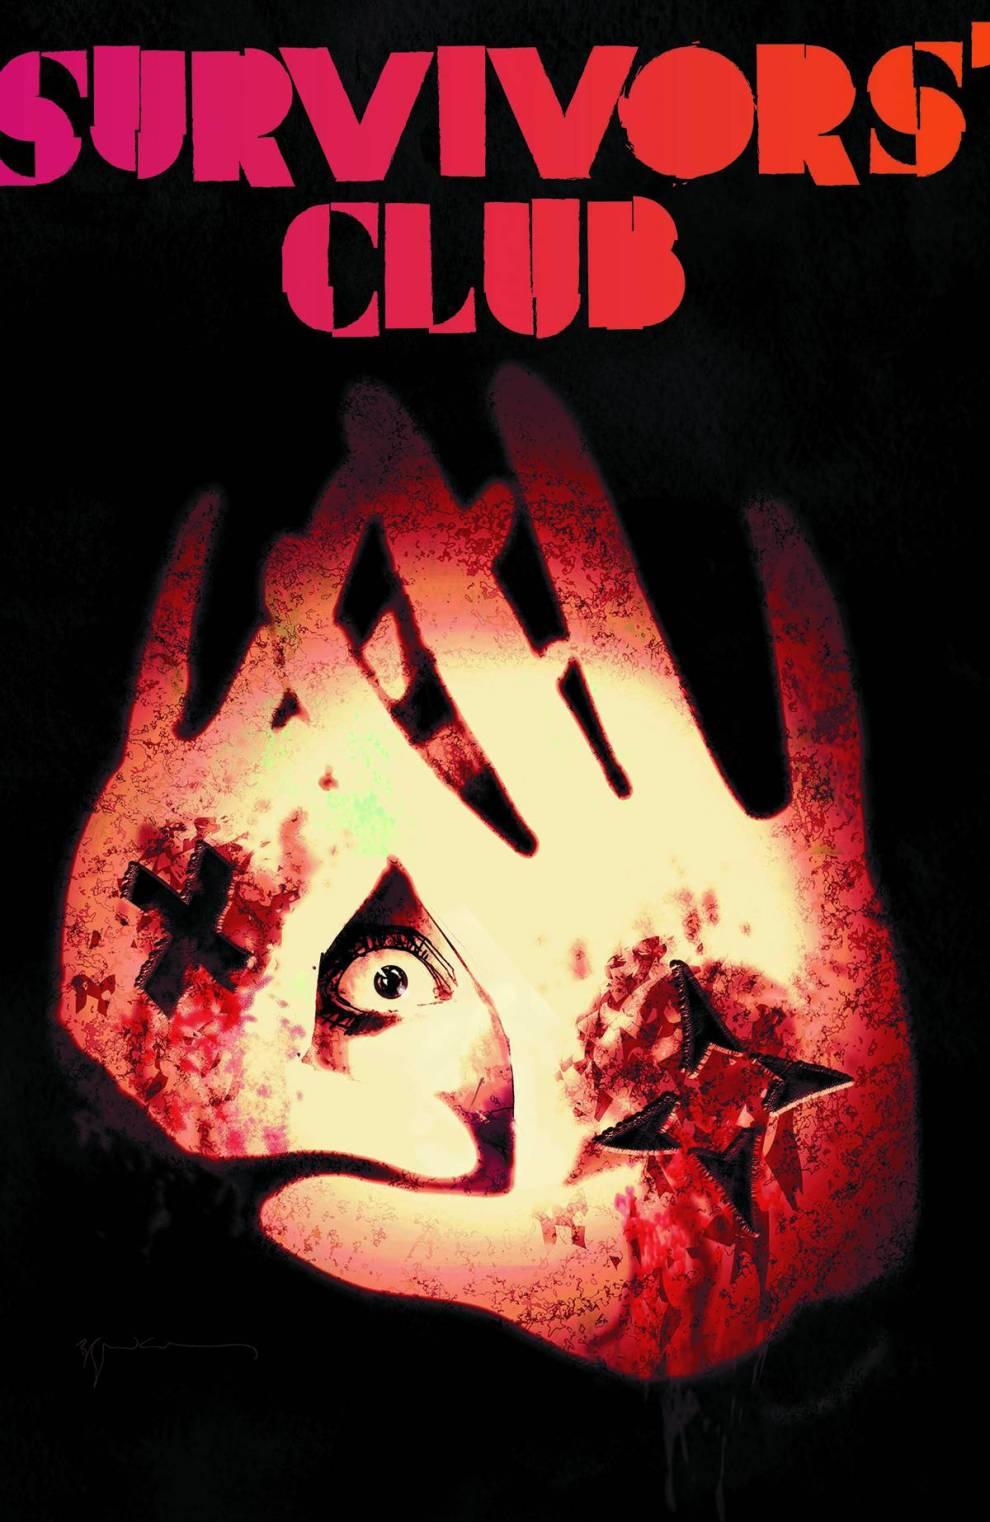 Survivors Club #1